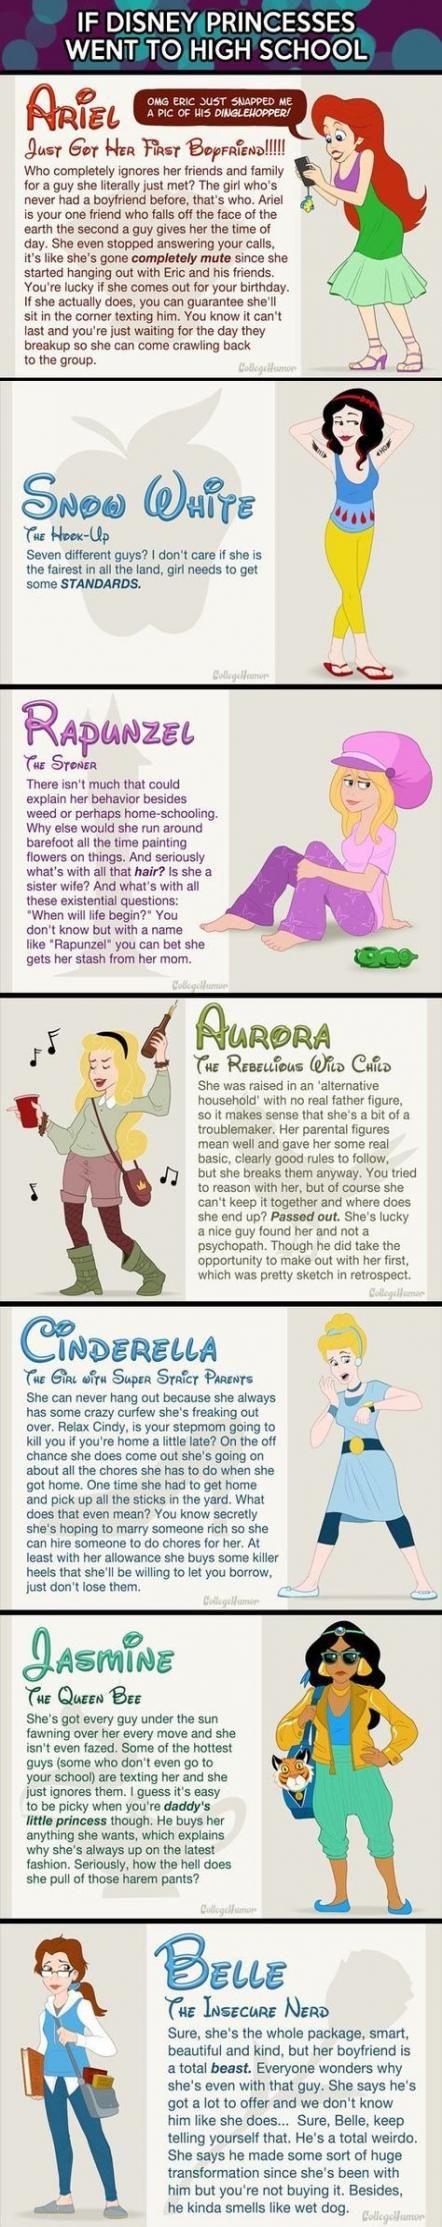 29 Ideas funny disney princess hilarious belle #funny